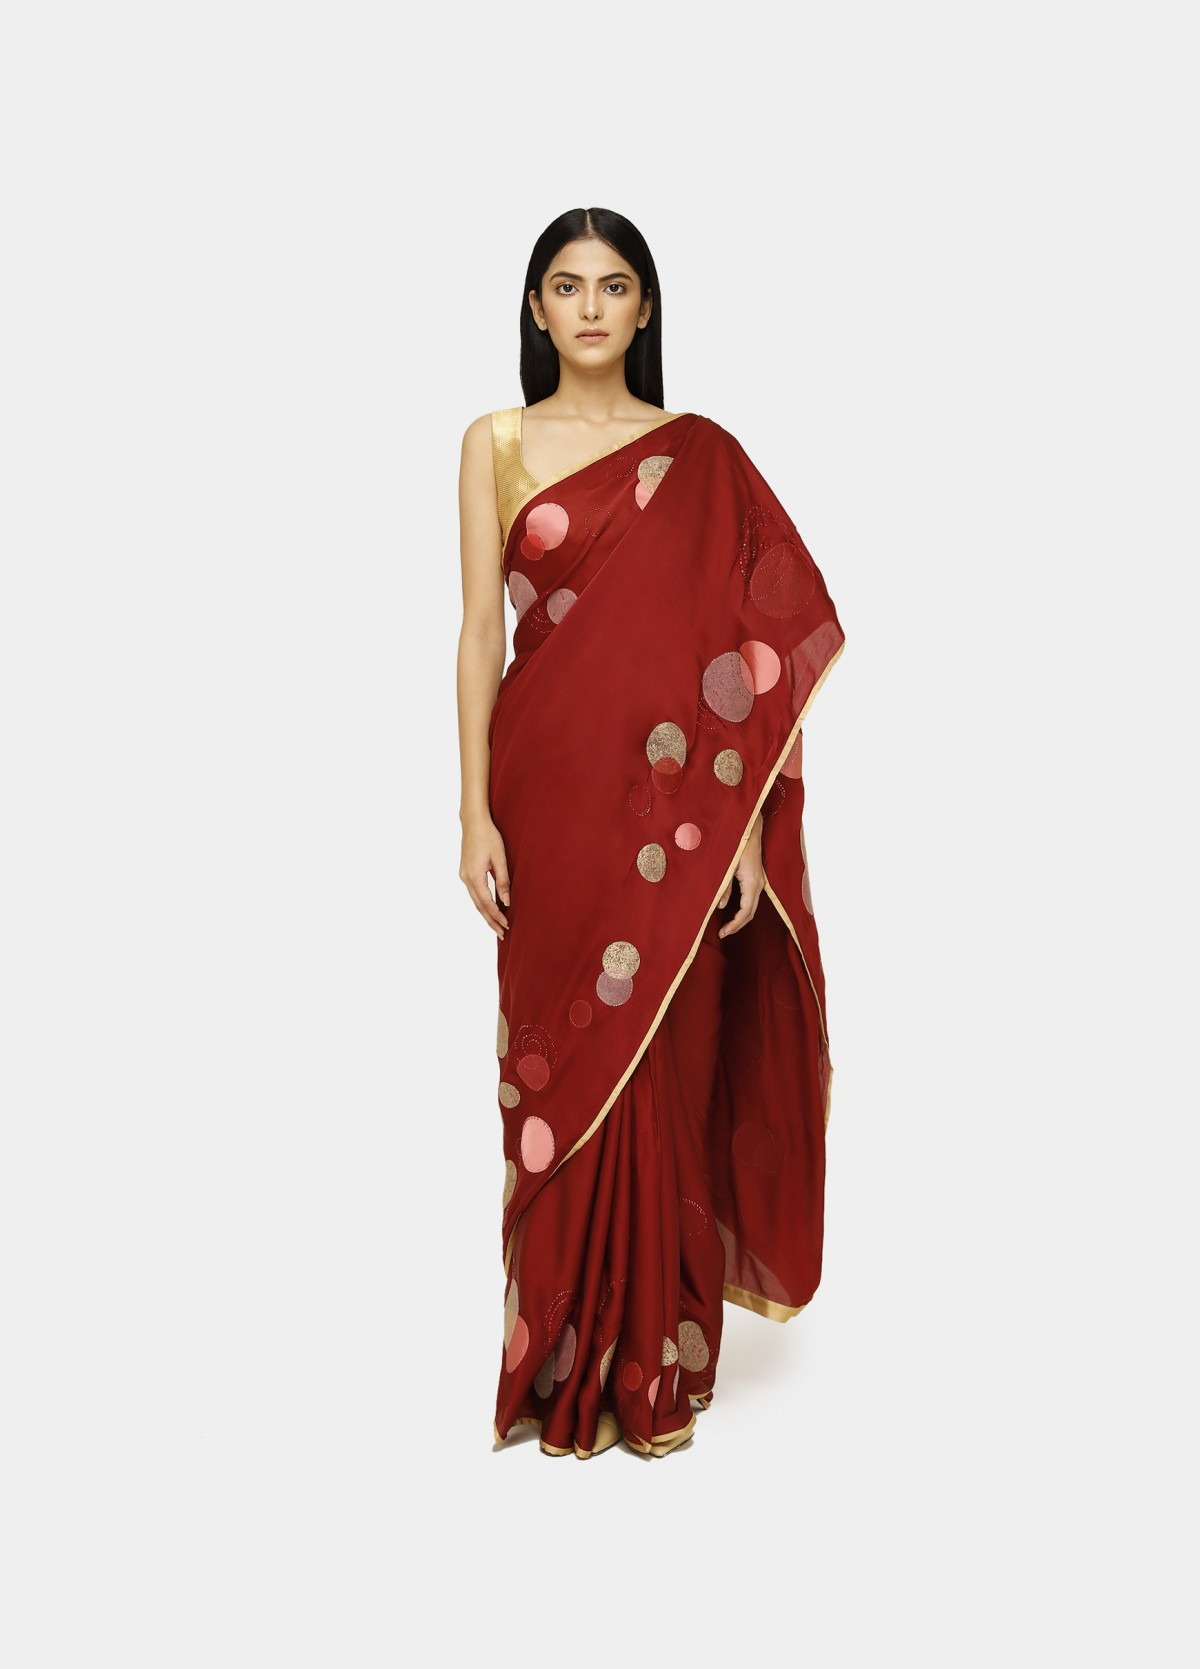 The Polka Tint Sari